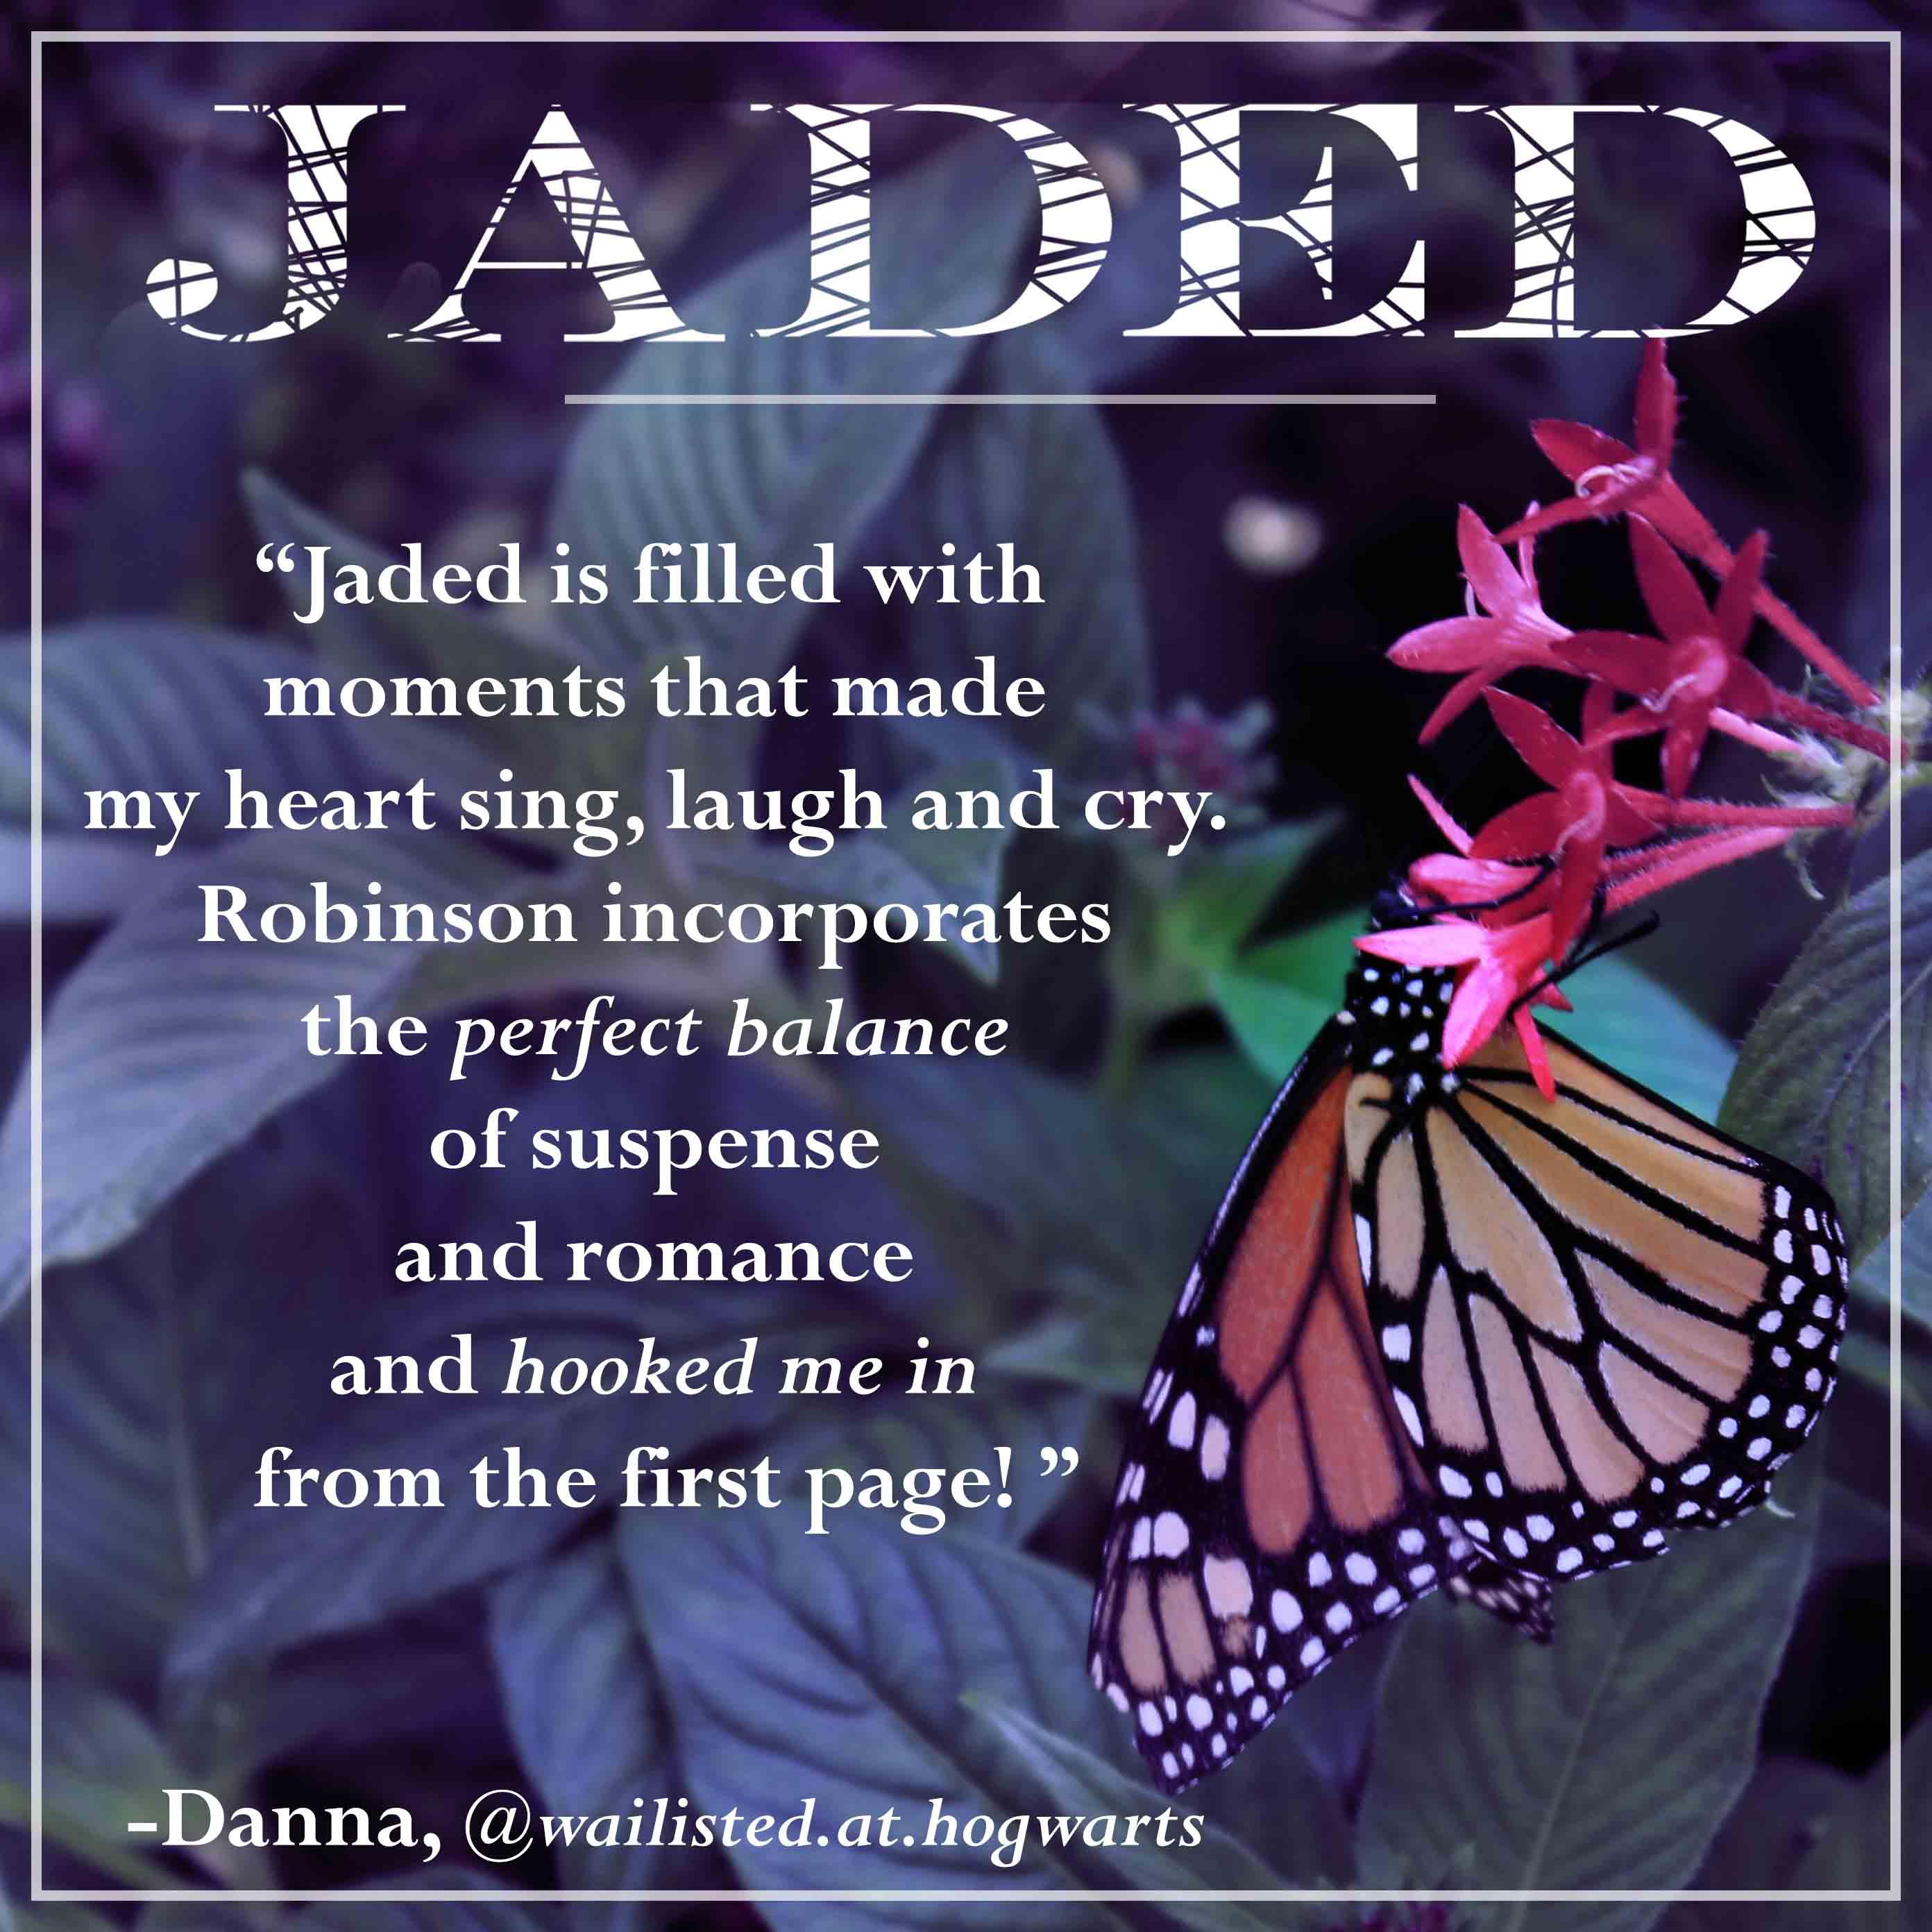 jaded fan quote-danna